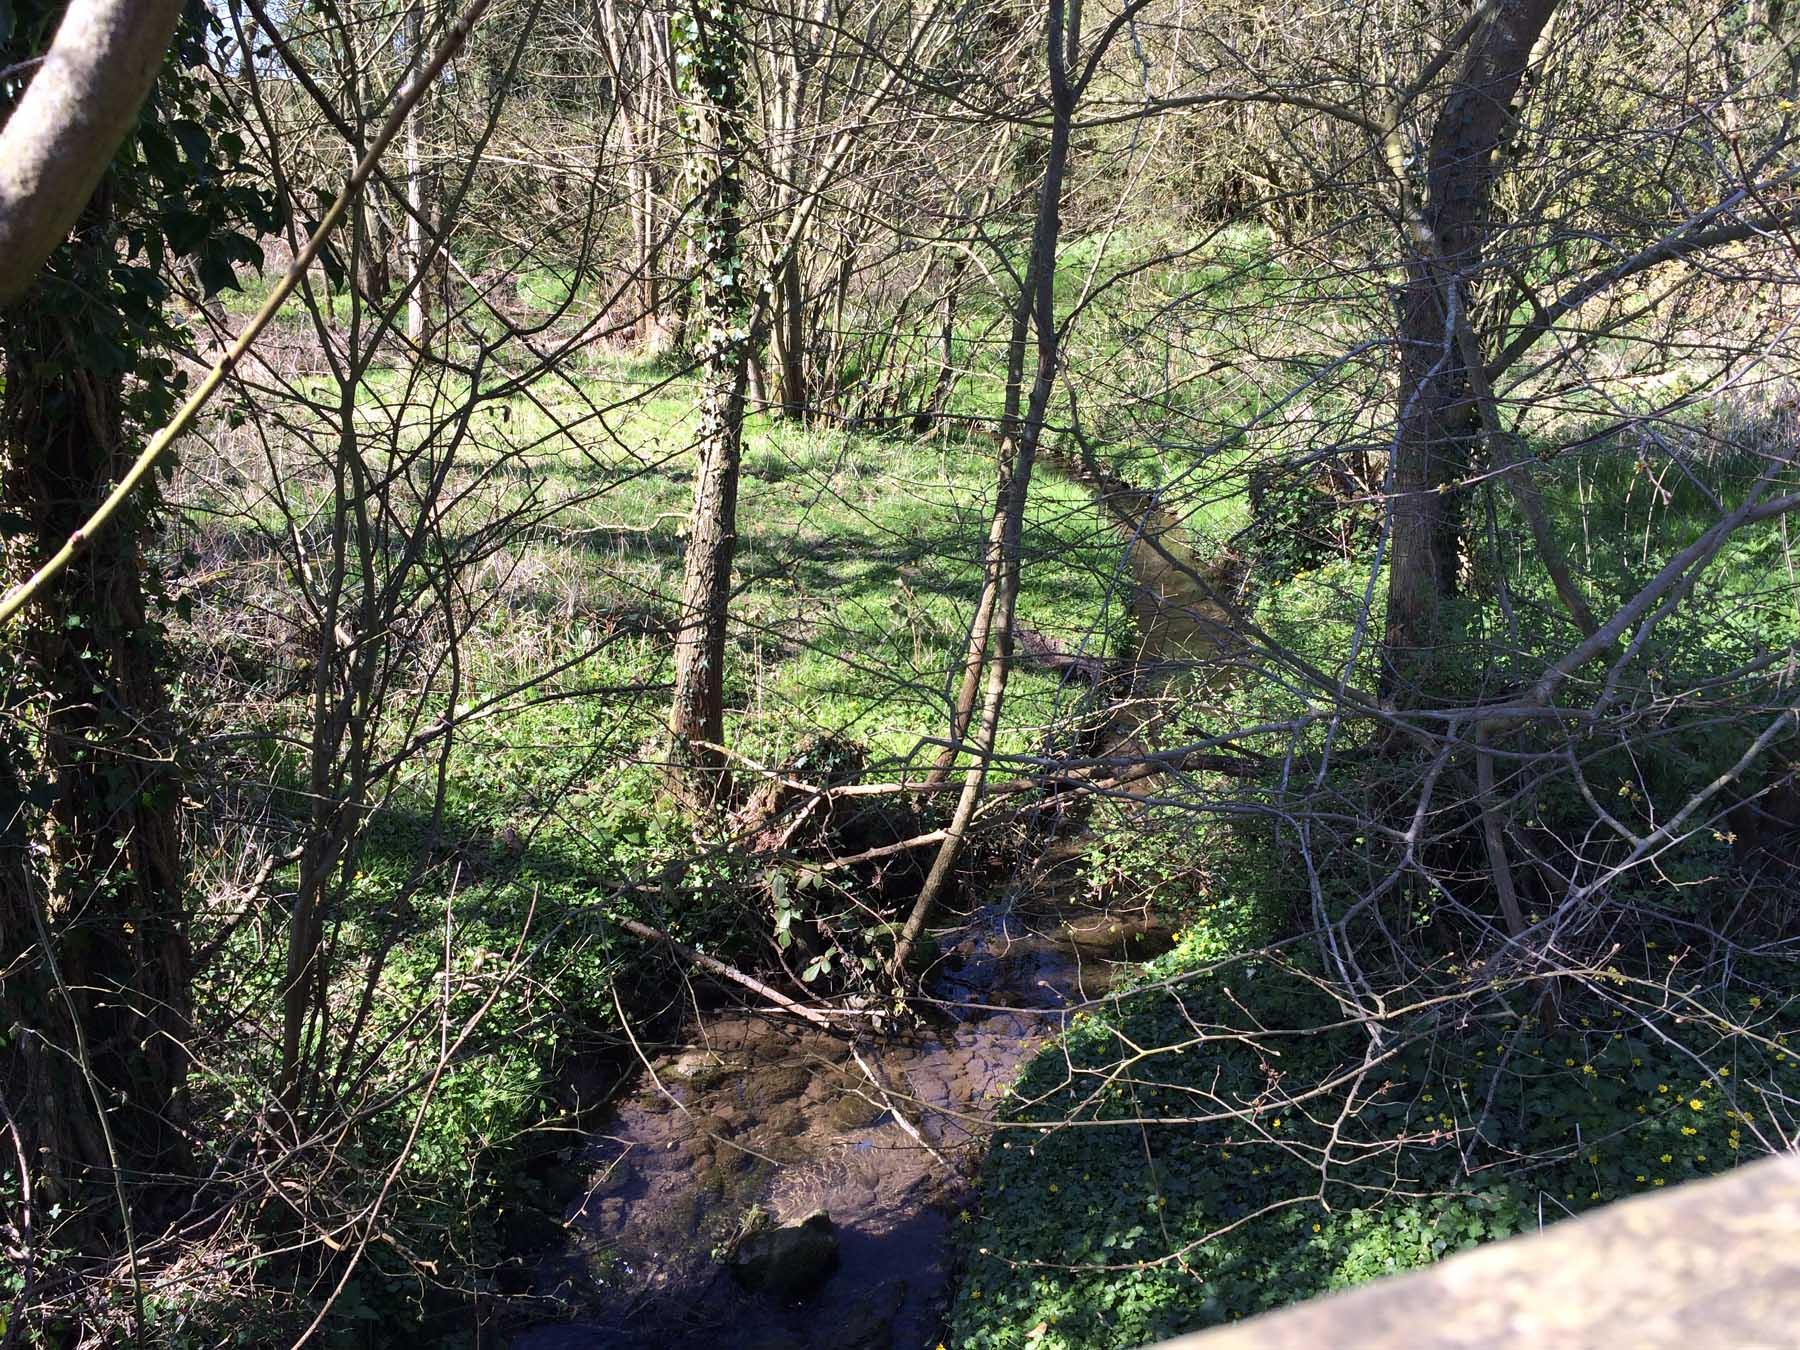 walk along little stream